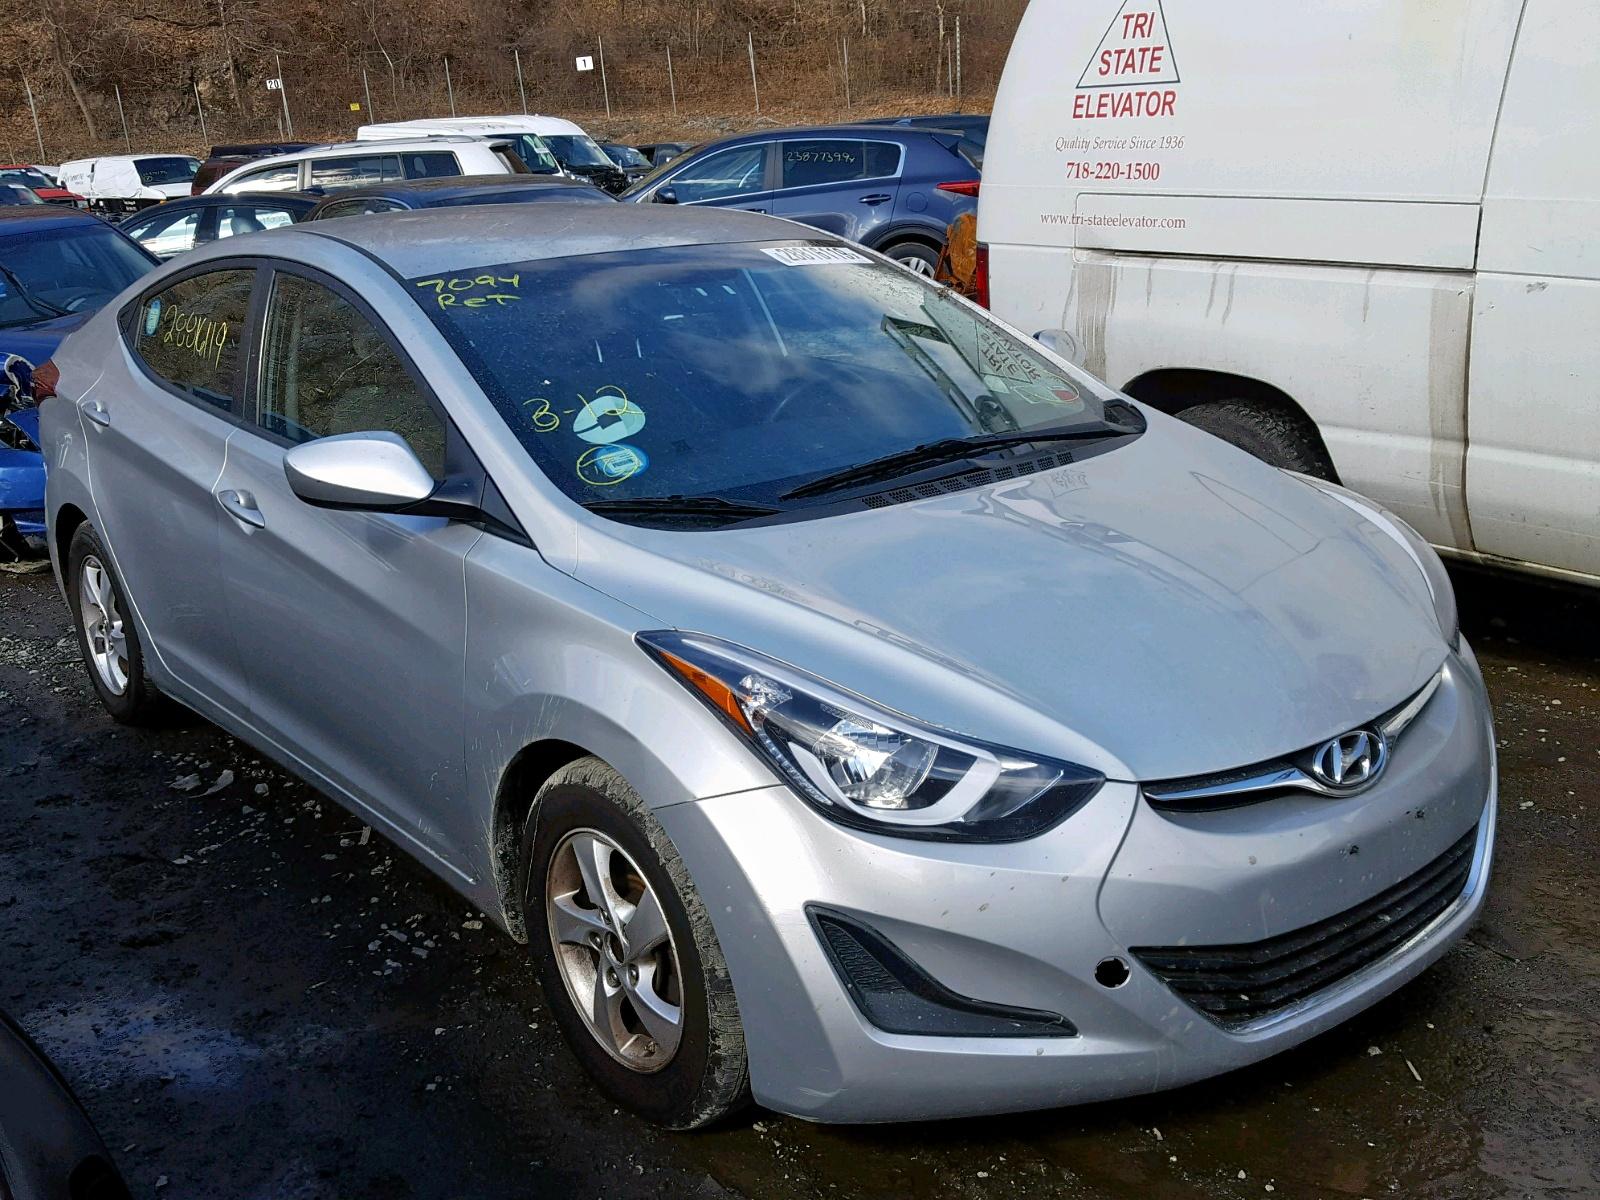 2015 Hyundai Elantra Se 1.8L Left View